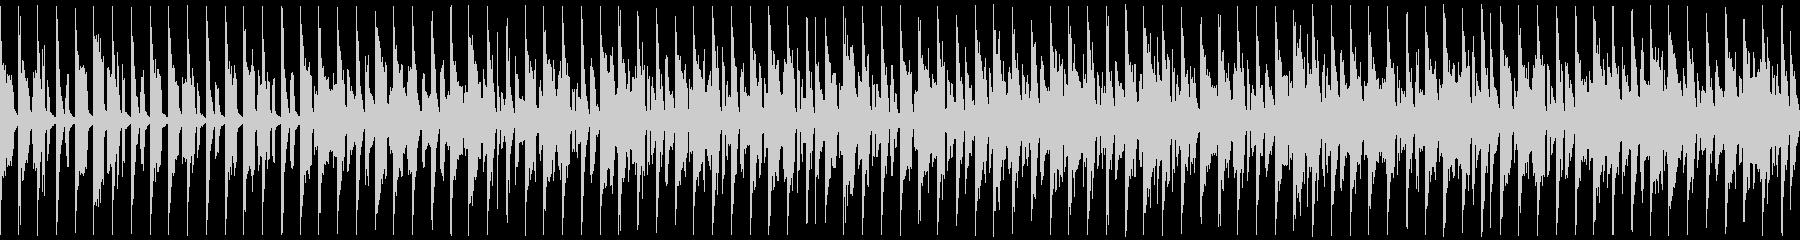 CMに合うトランス風シンセ【ループ】の未再生の波形